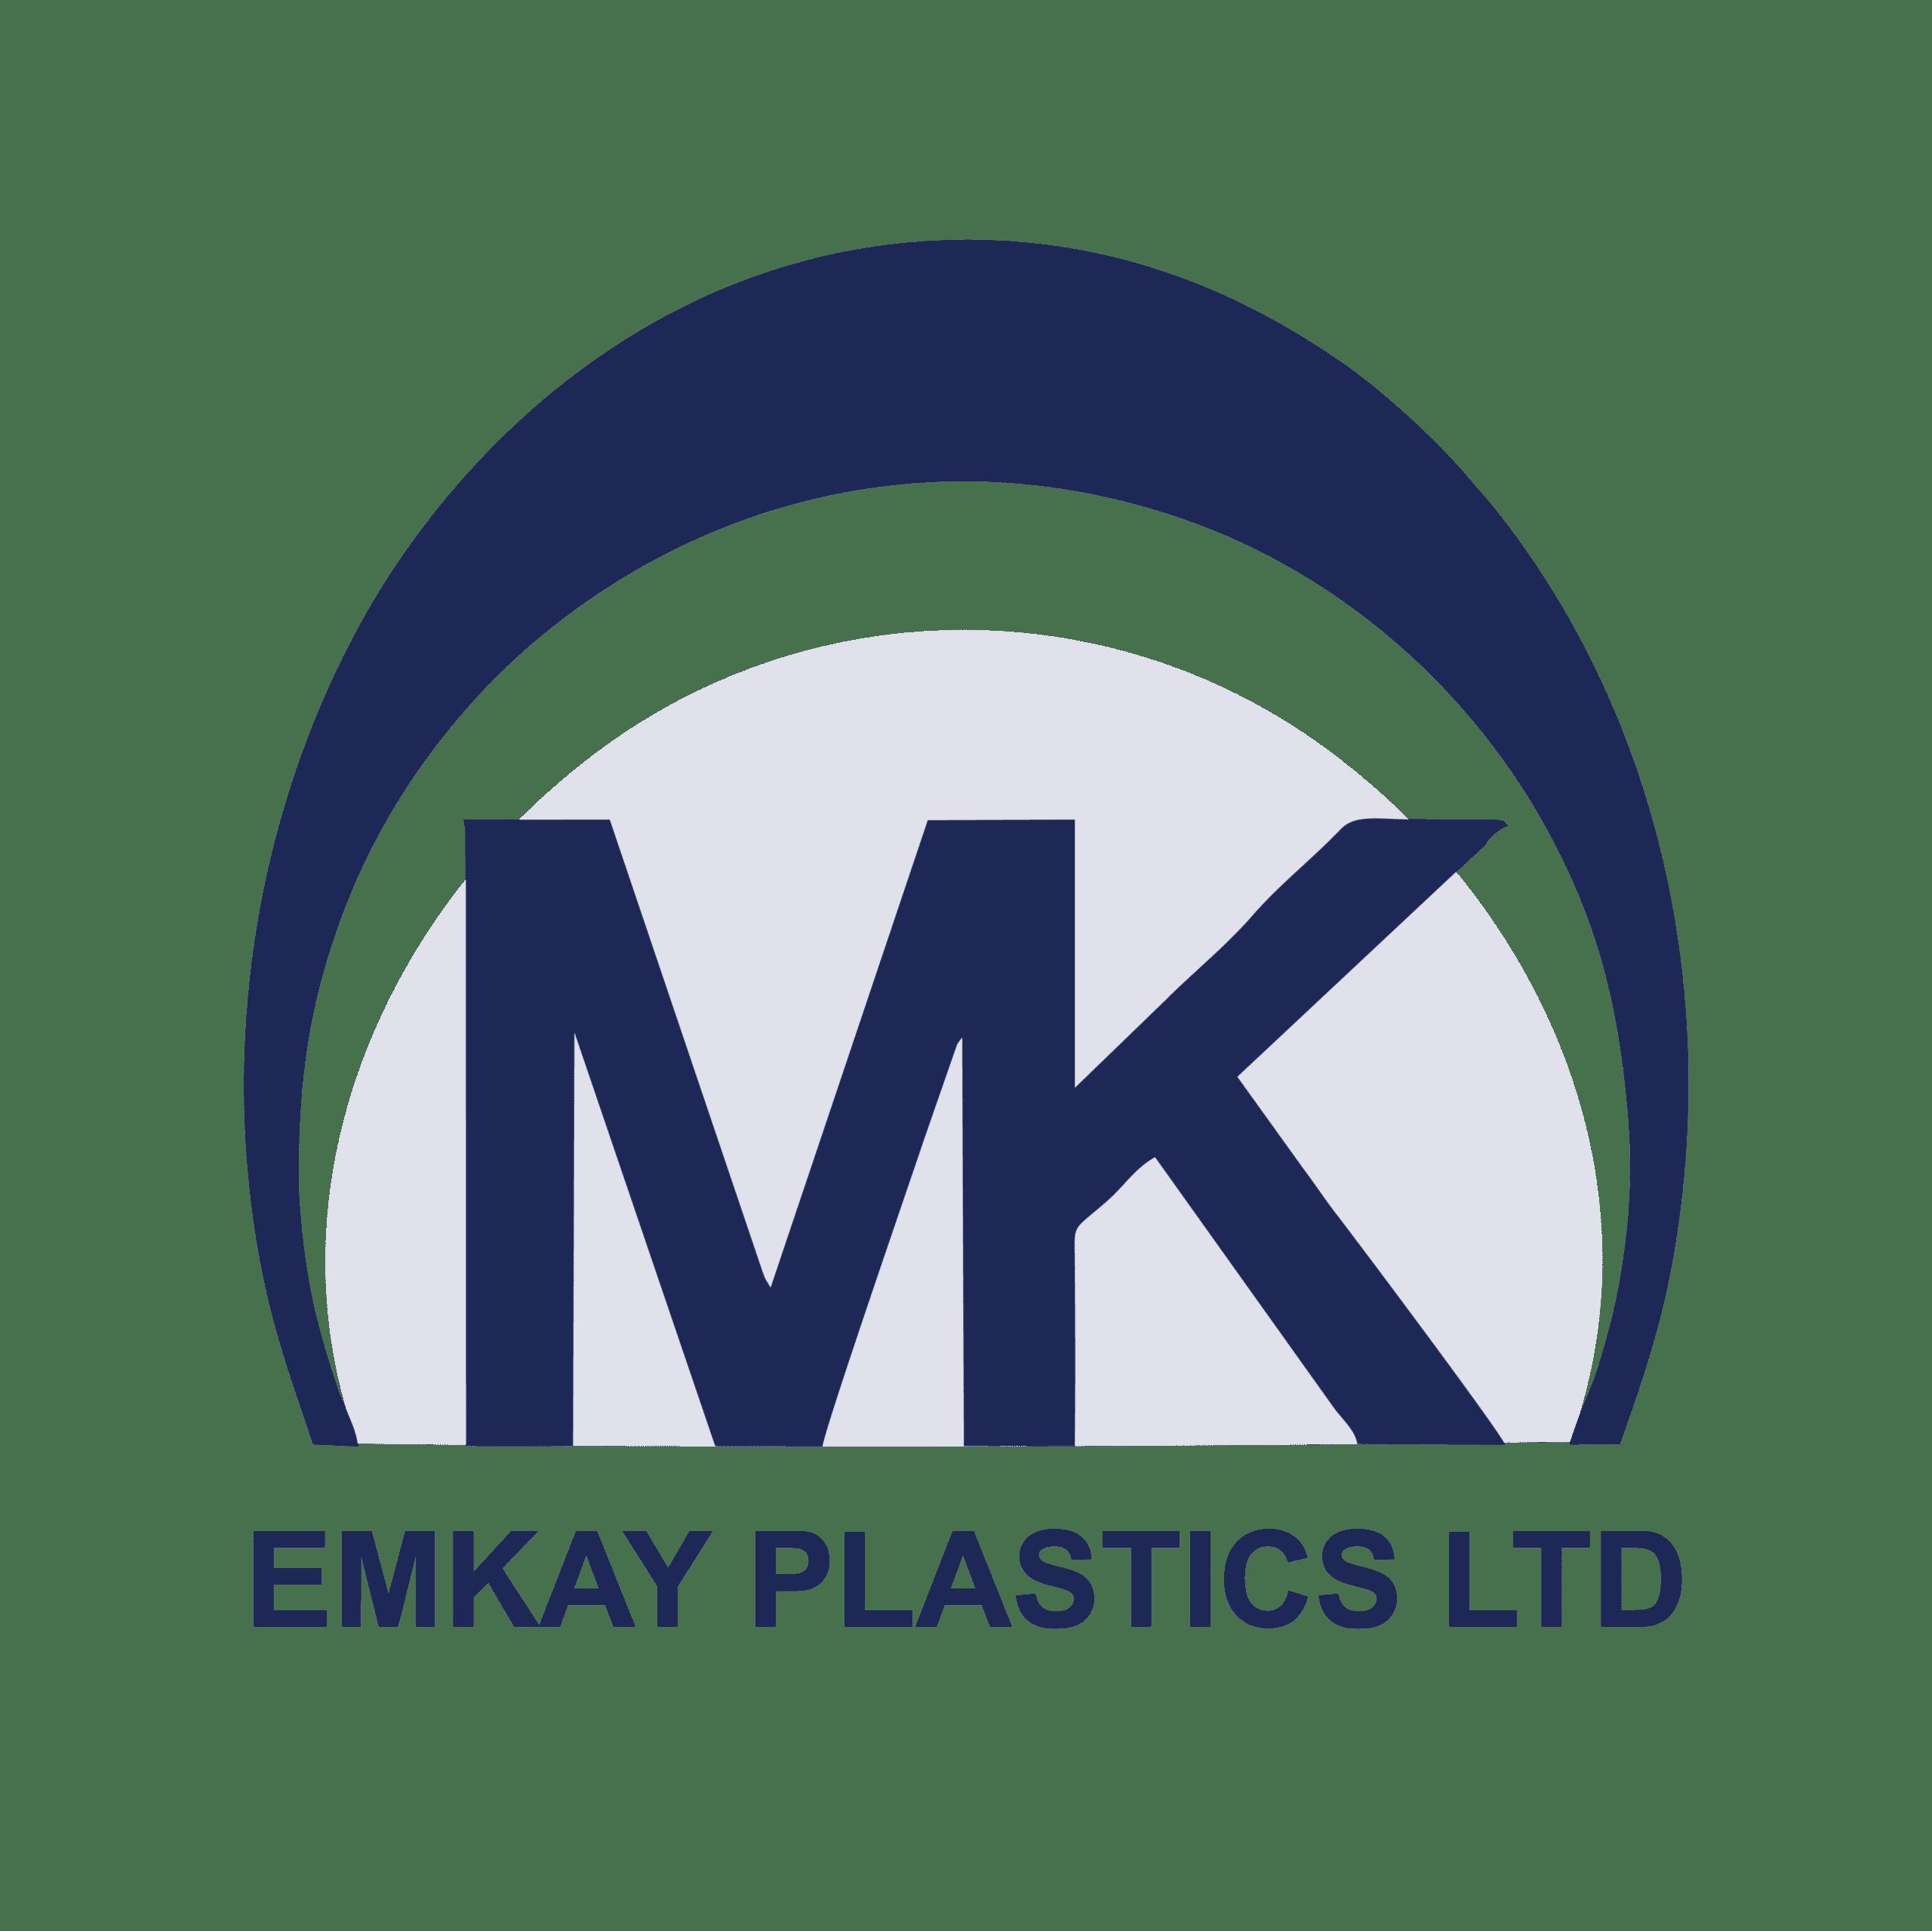 Emkay Plastics main Logo